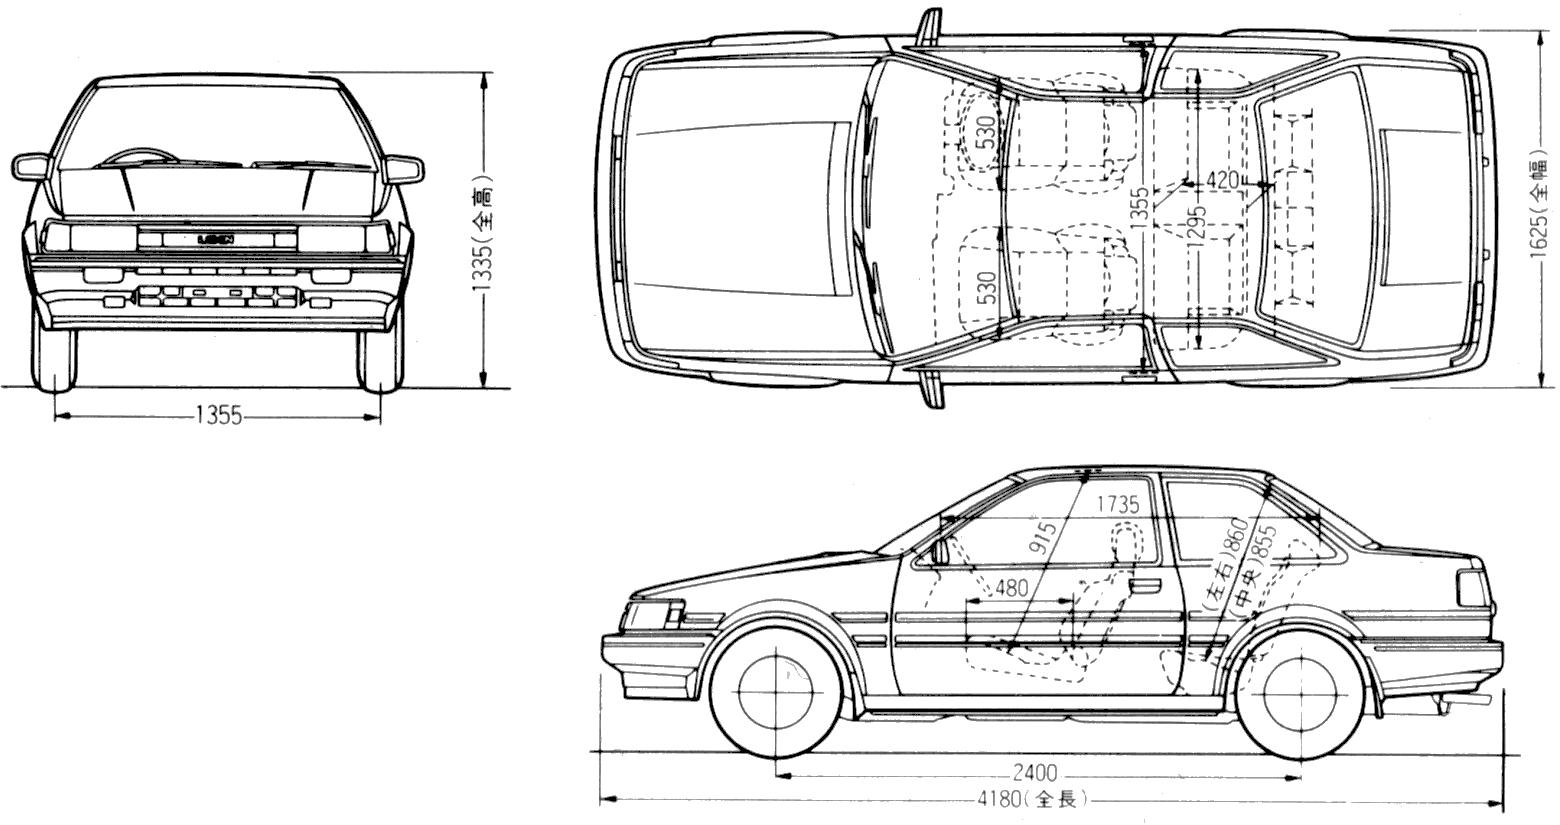 Toyota Levin Ae86 2 Door Coupe Blueprints Free